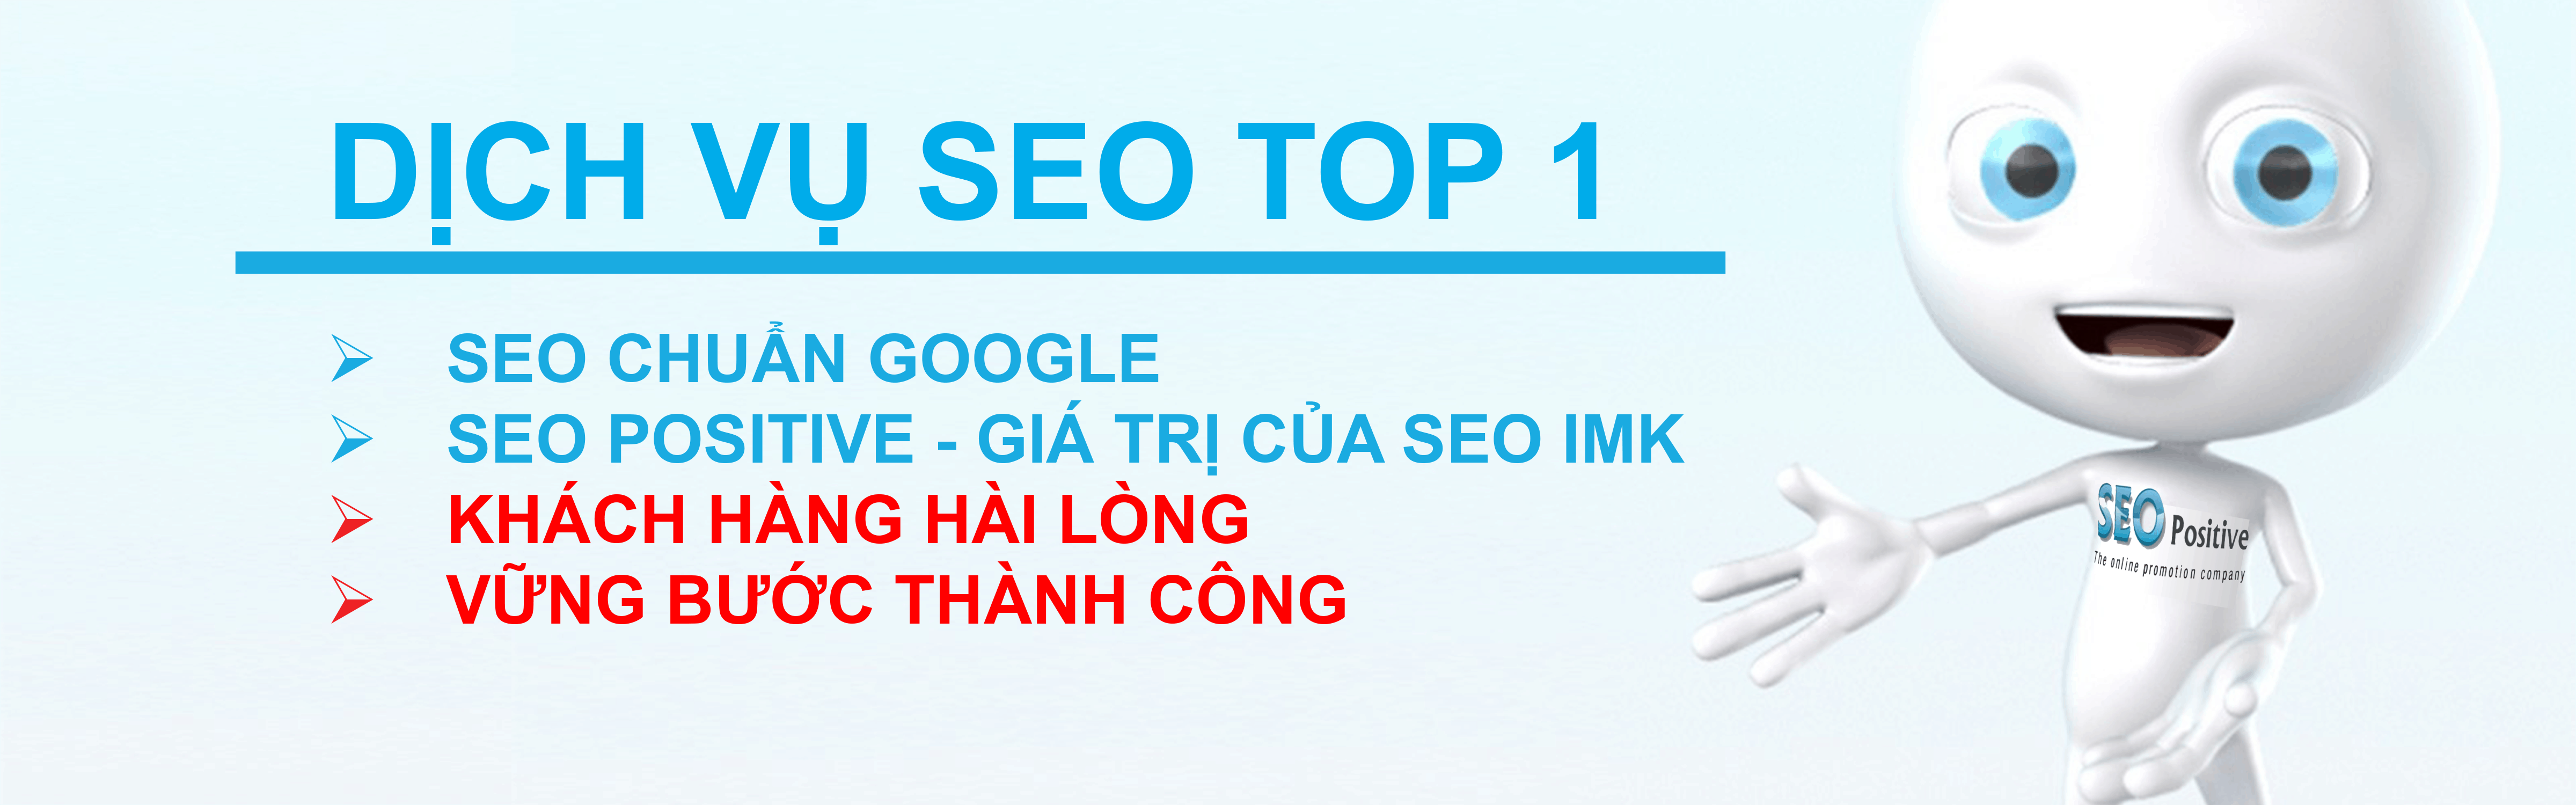 banner-seoimk-3